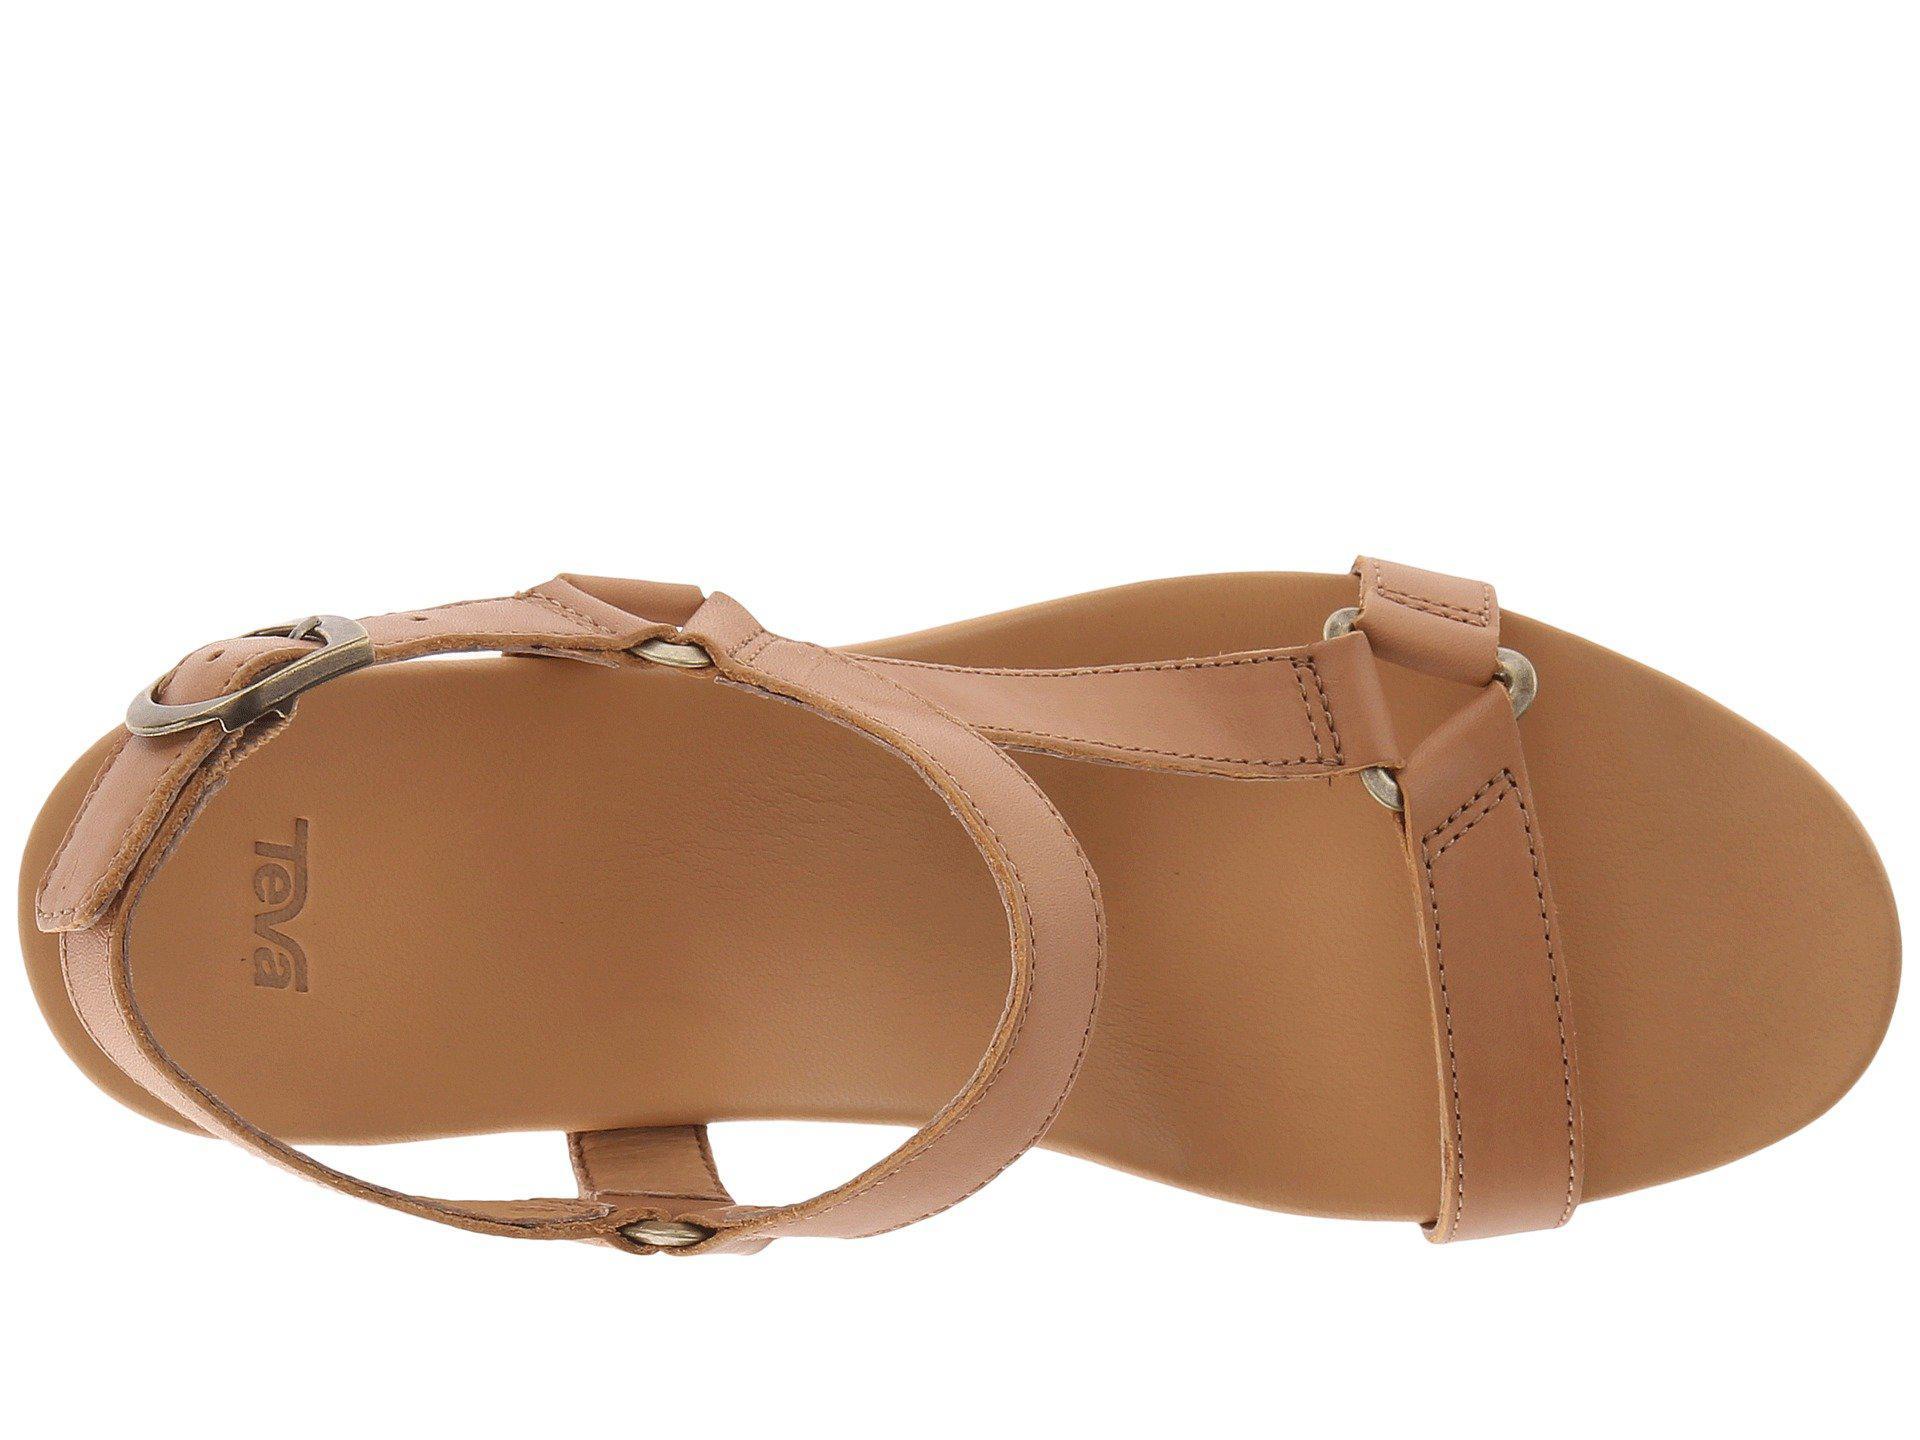 feea7f155173 Teva - Brown Arrabelle Universal Leather - Lyst. View fullscreen